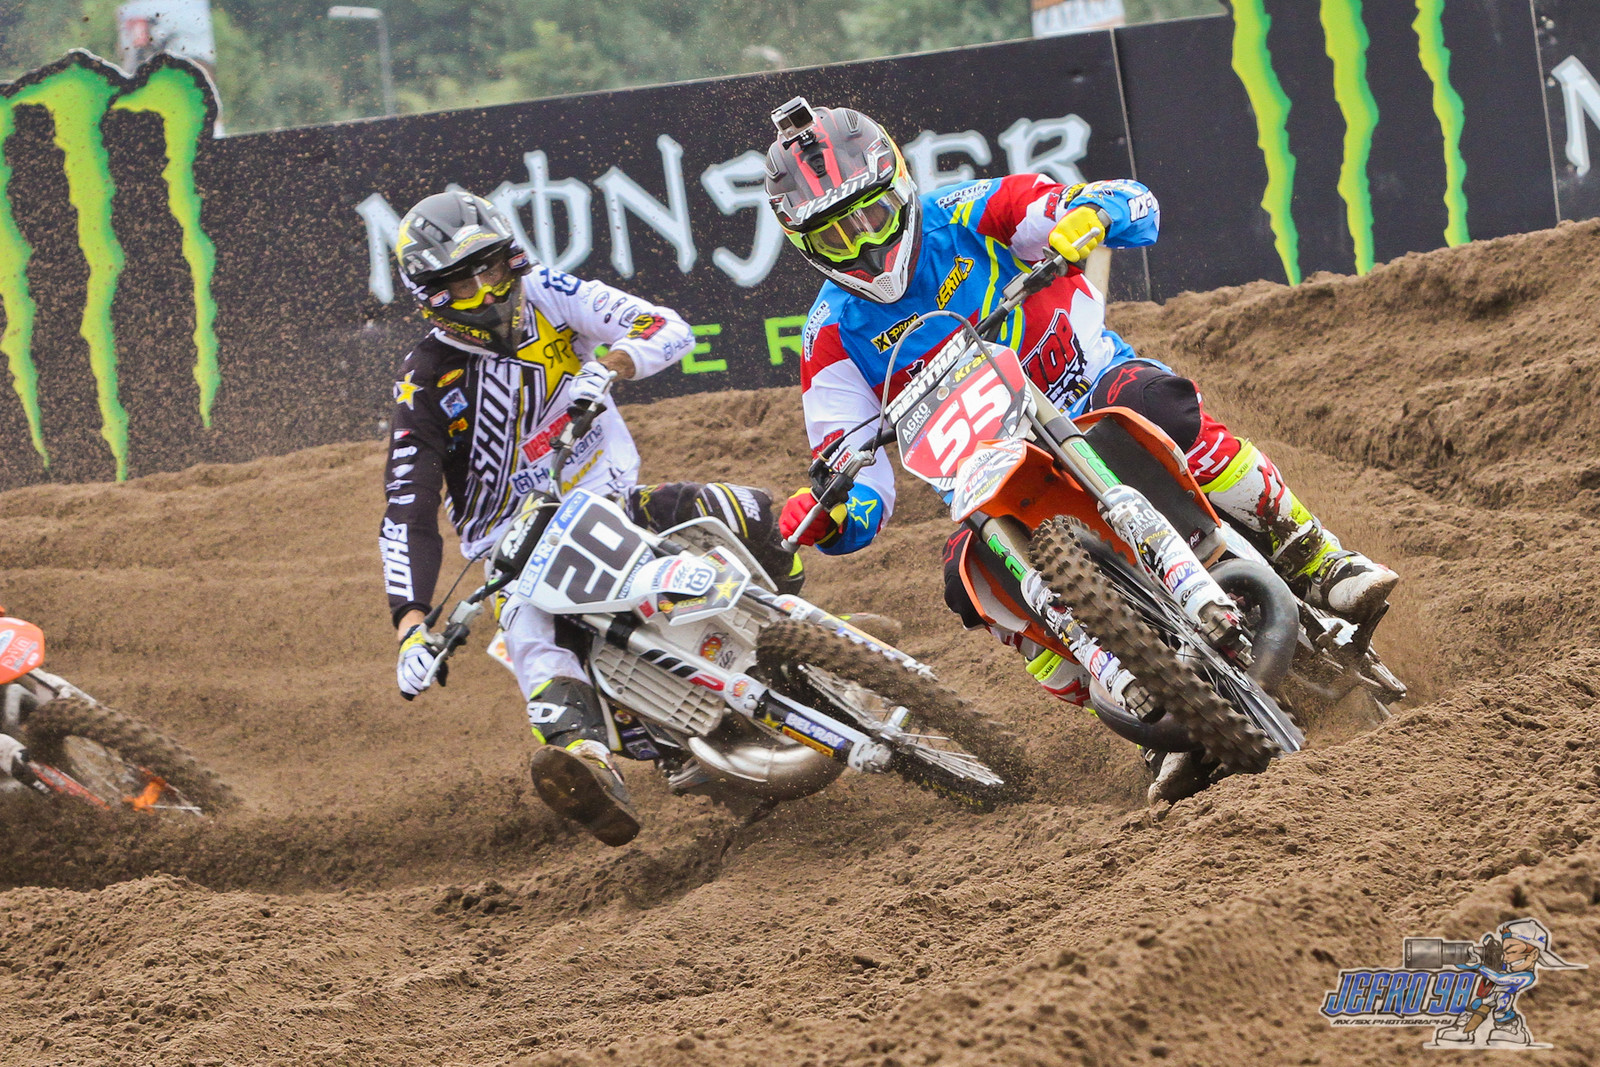 Mike Kras - Photo Gallery: MXGP of Limburg - Motocross Pictures - Vital MX